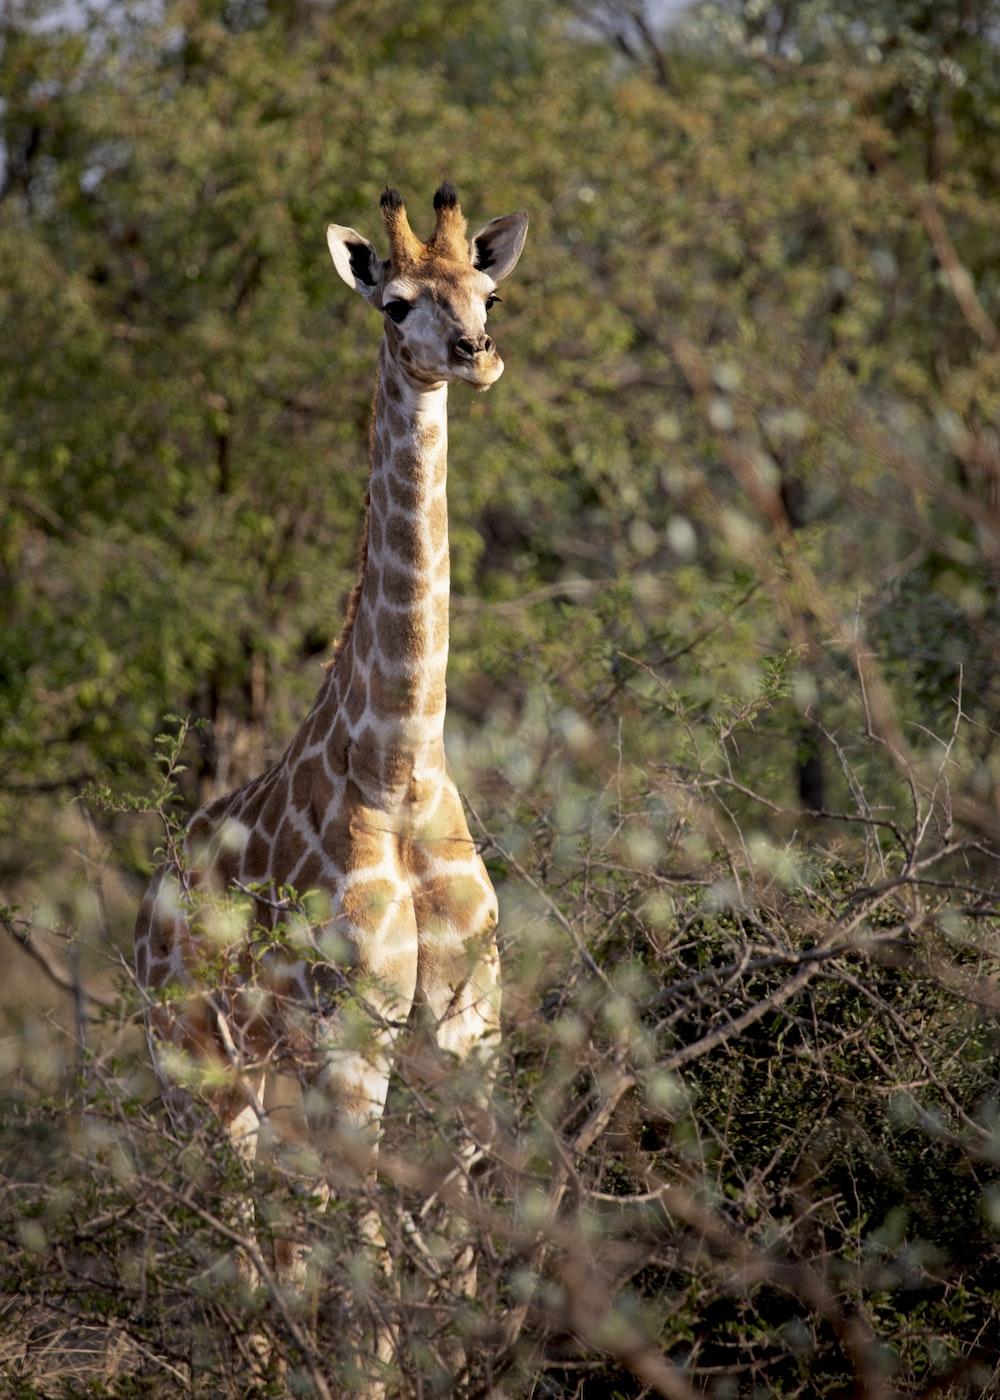 giraffe photo across trees